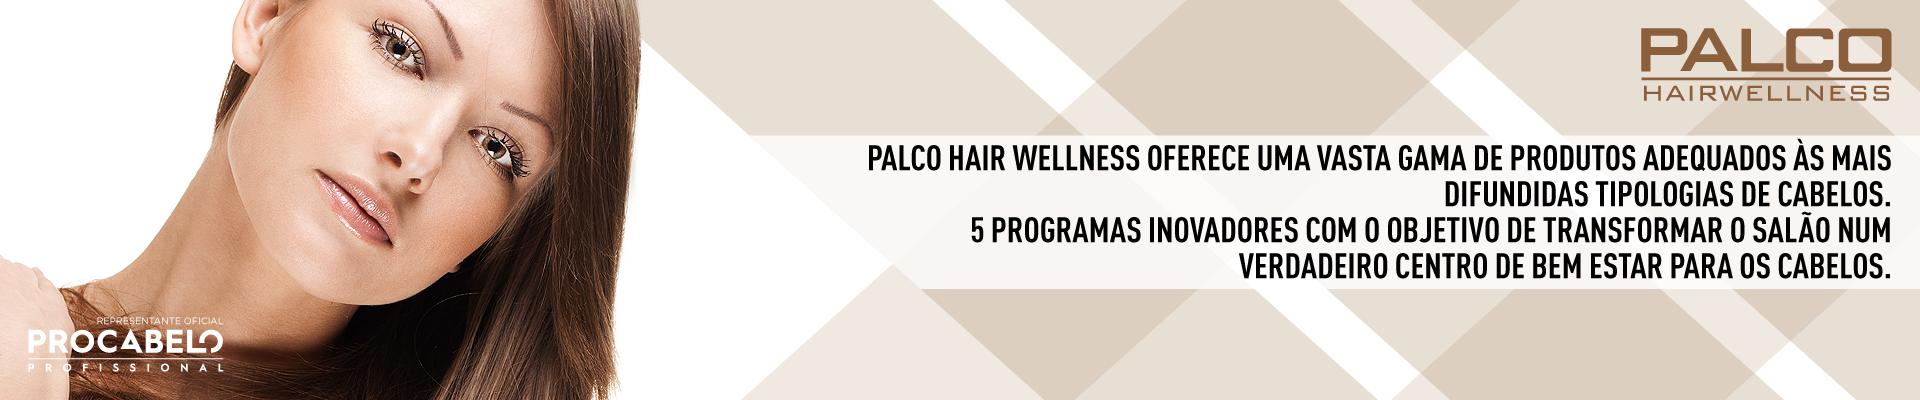 Hairwellness Palco